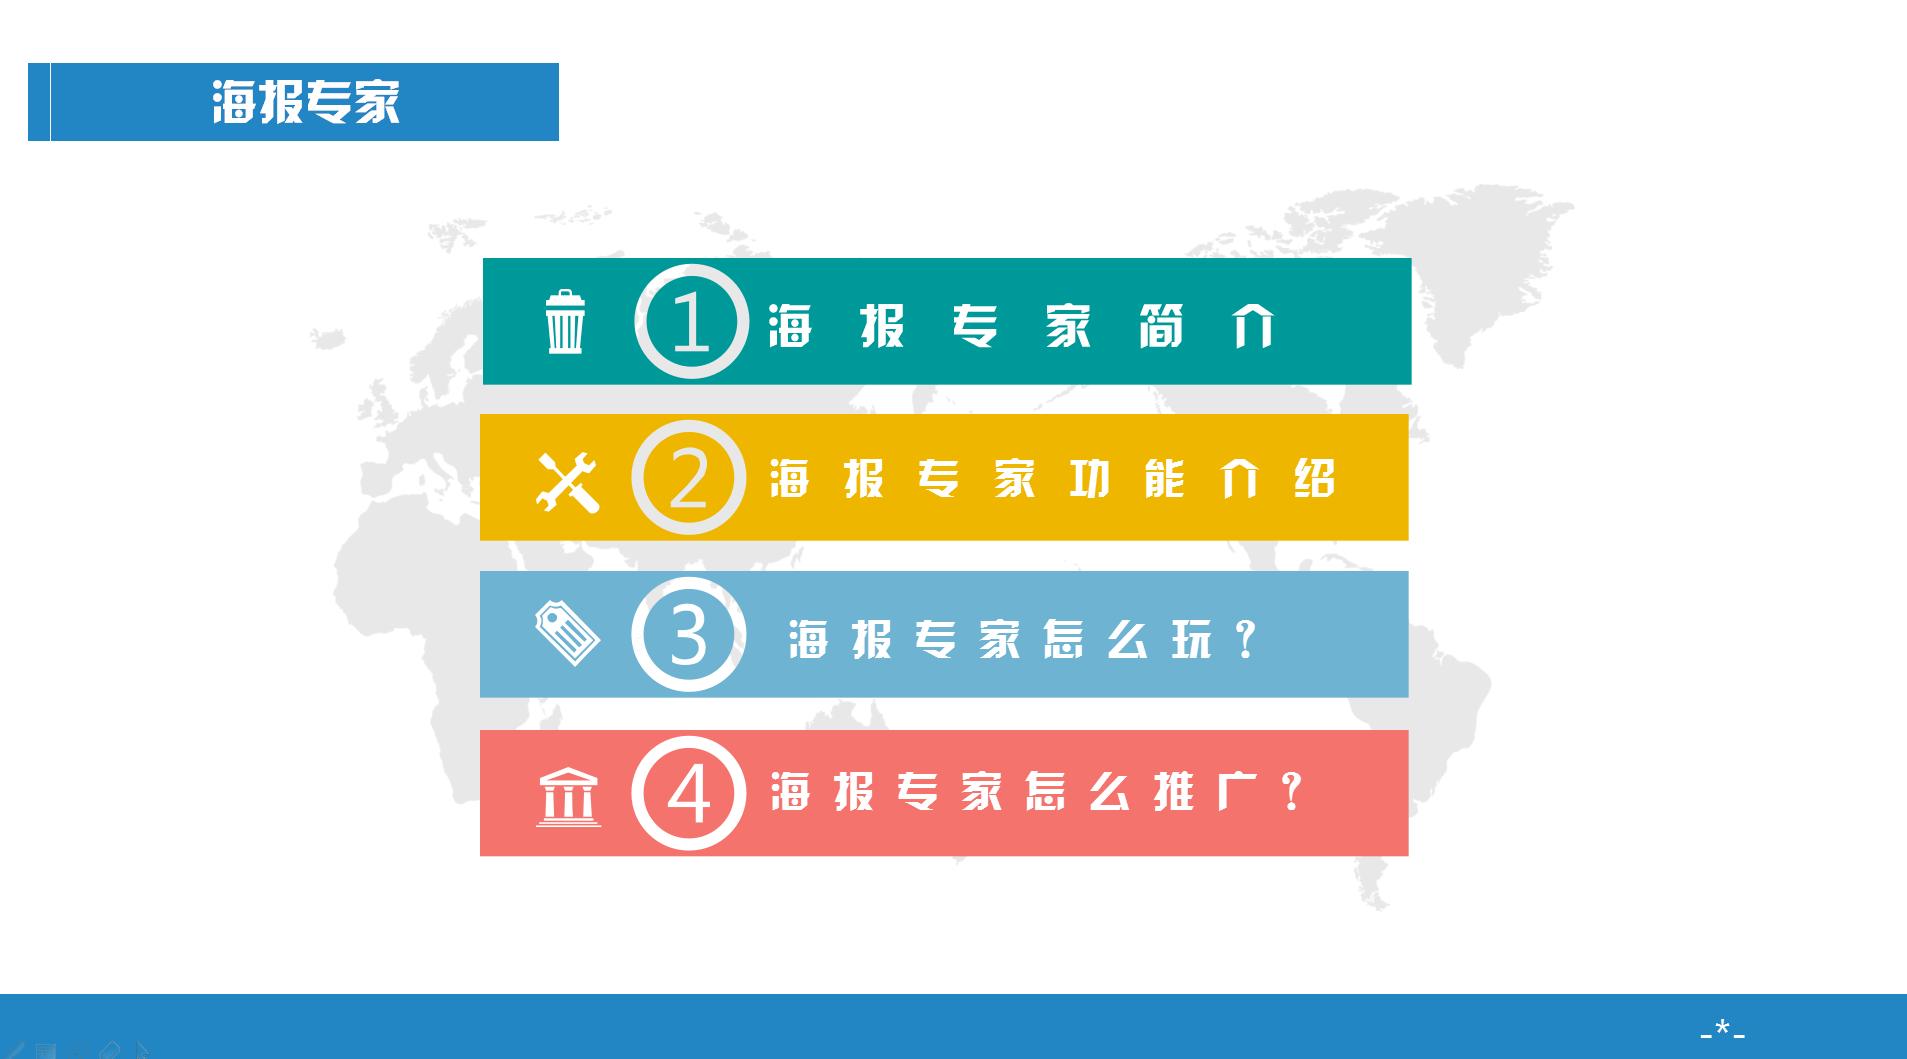 wq模块海报专家红包版2.4.0 修复版-渔枫网络资源网